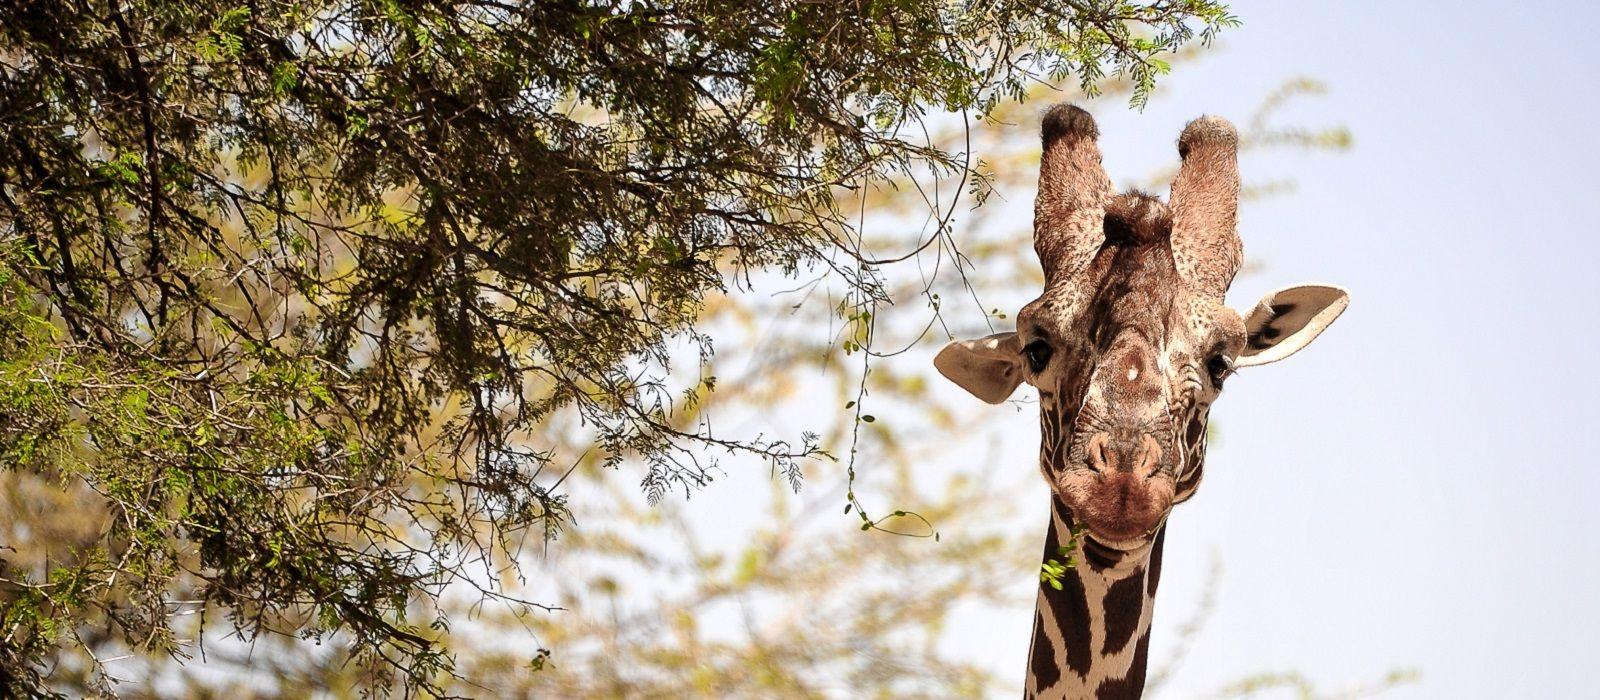 Atua Enkop Exclusive: Kenya Safari and Beach Break Tour Trip 3